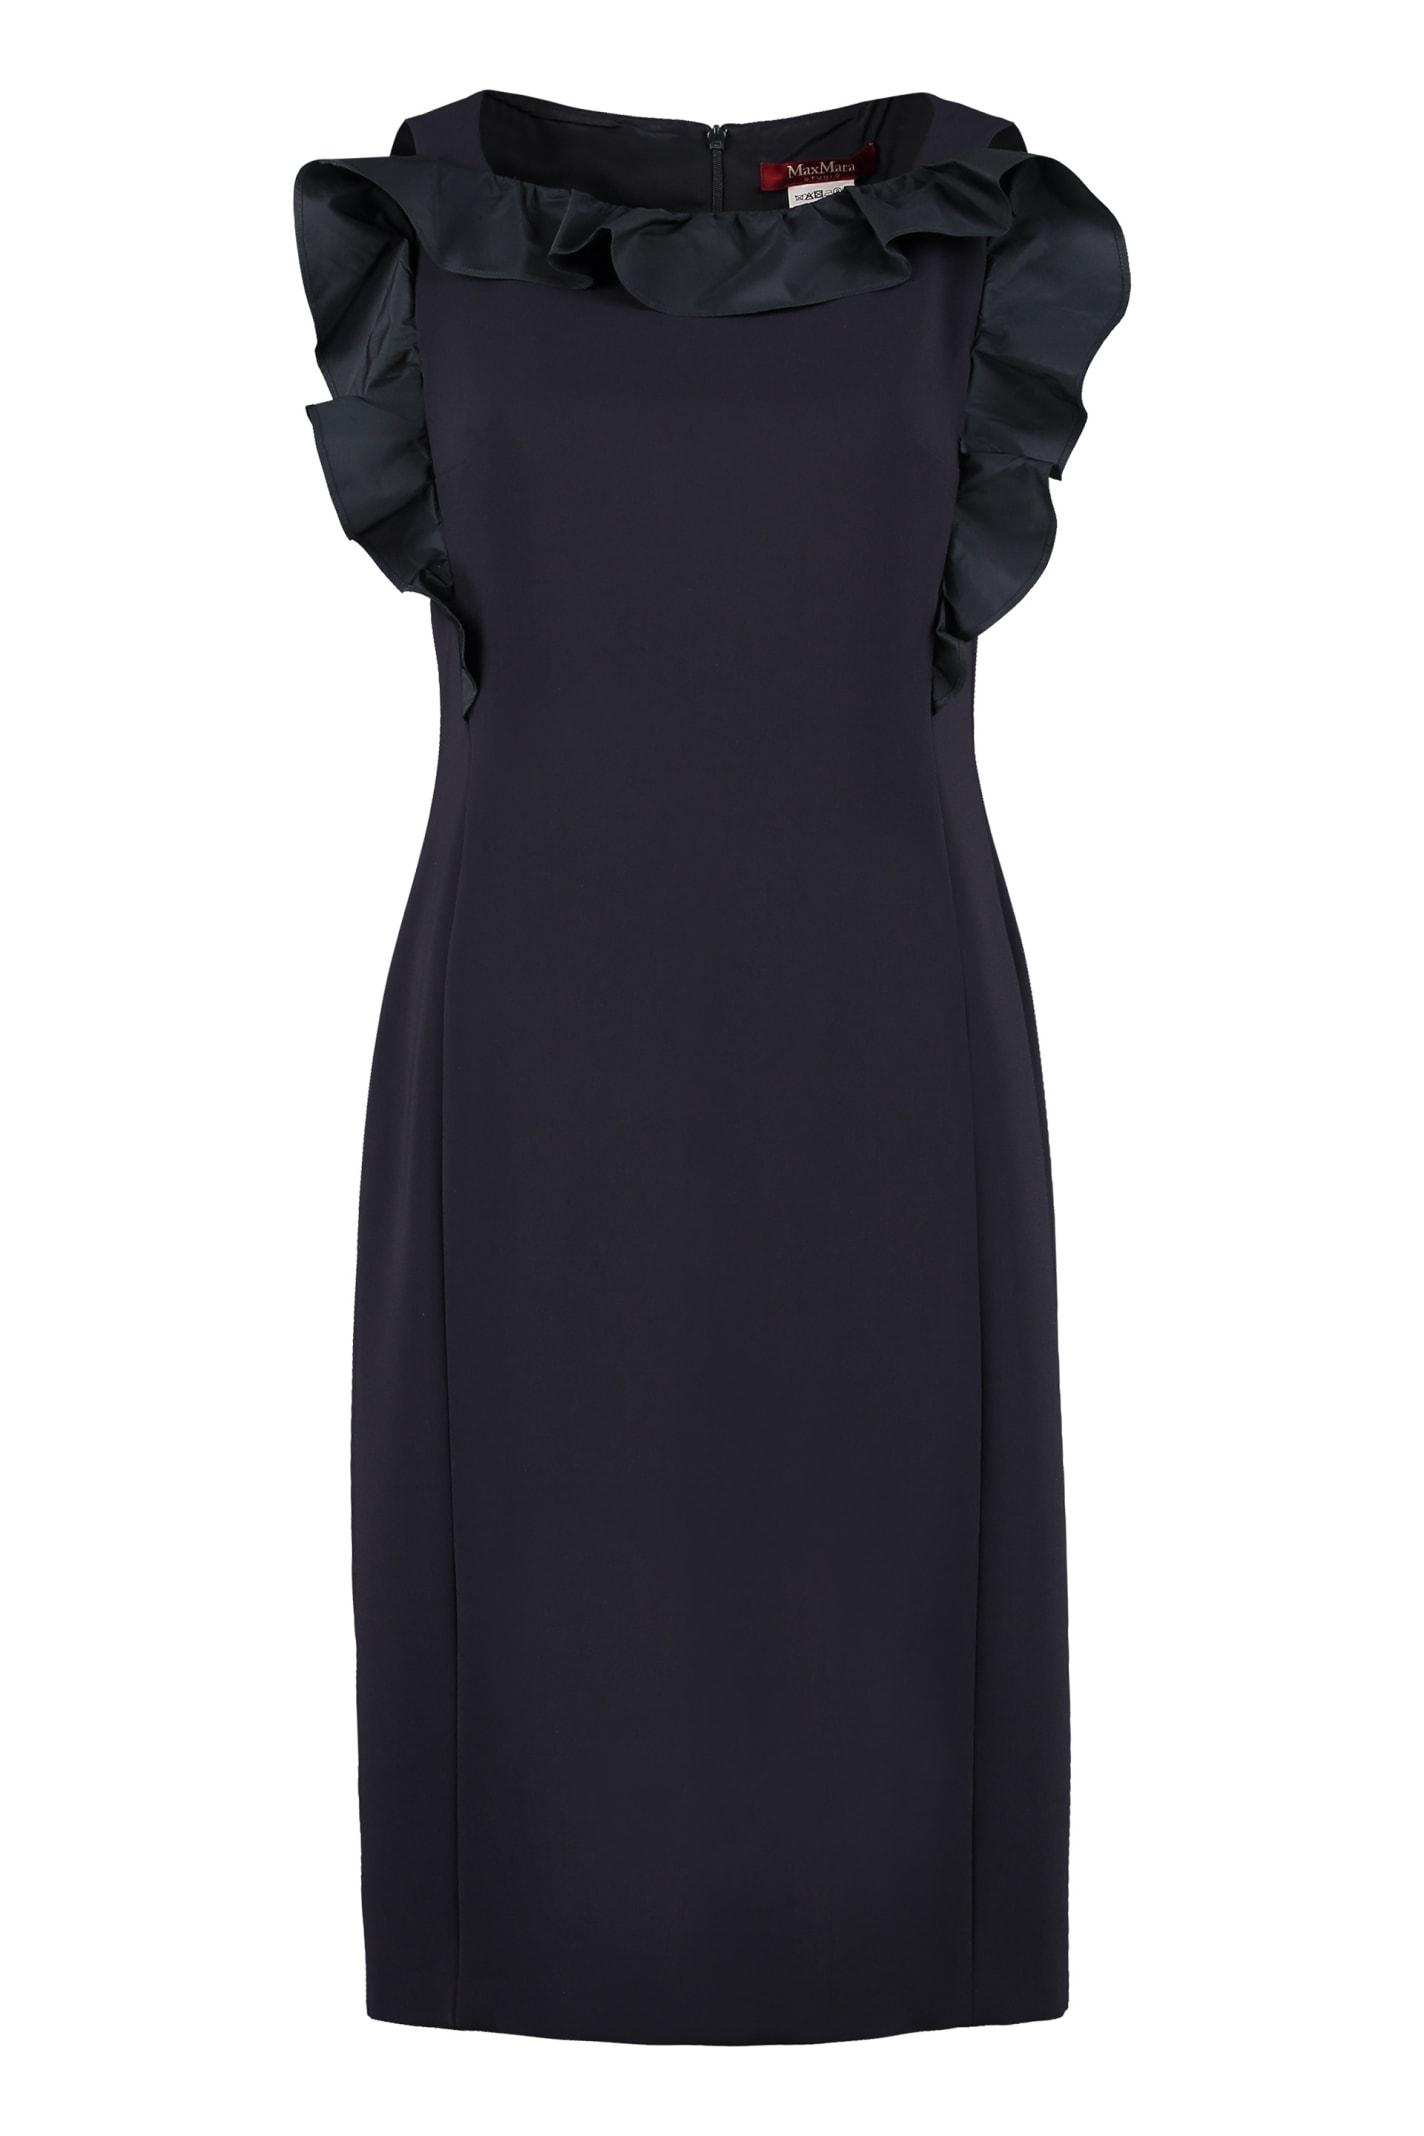 Buy Max Mara Studio Lastra Ruffled Sheath Dress online, shop Max Mara Studio with free shipping